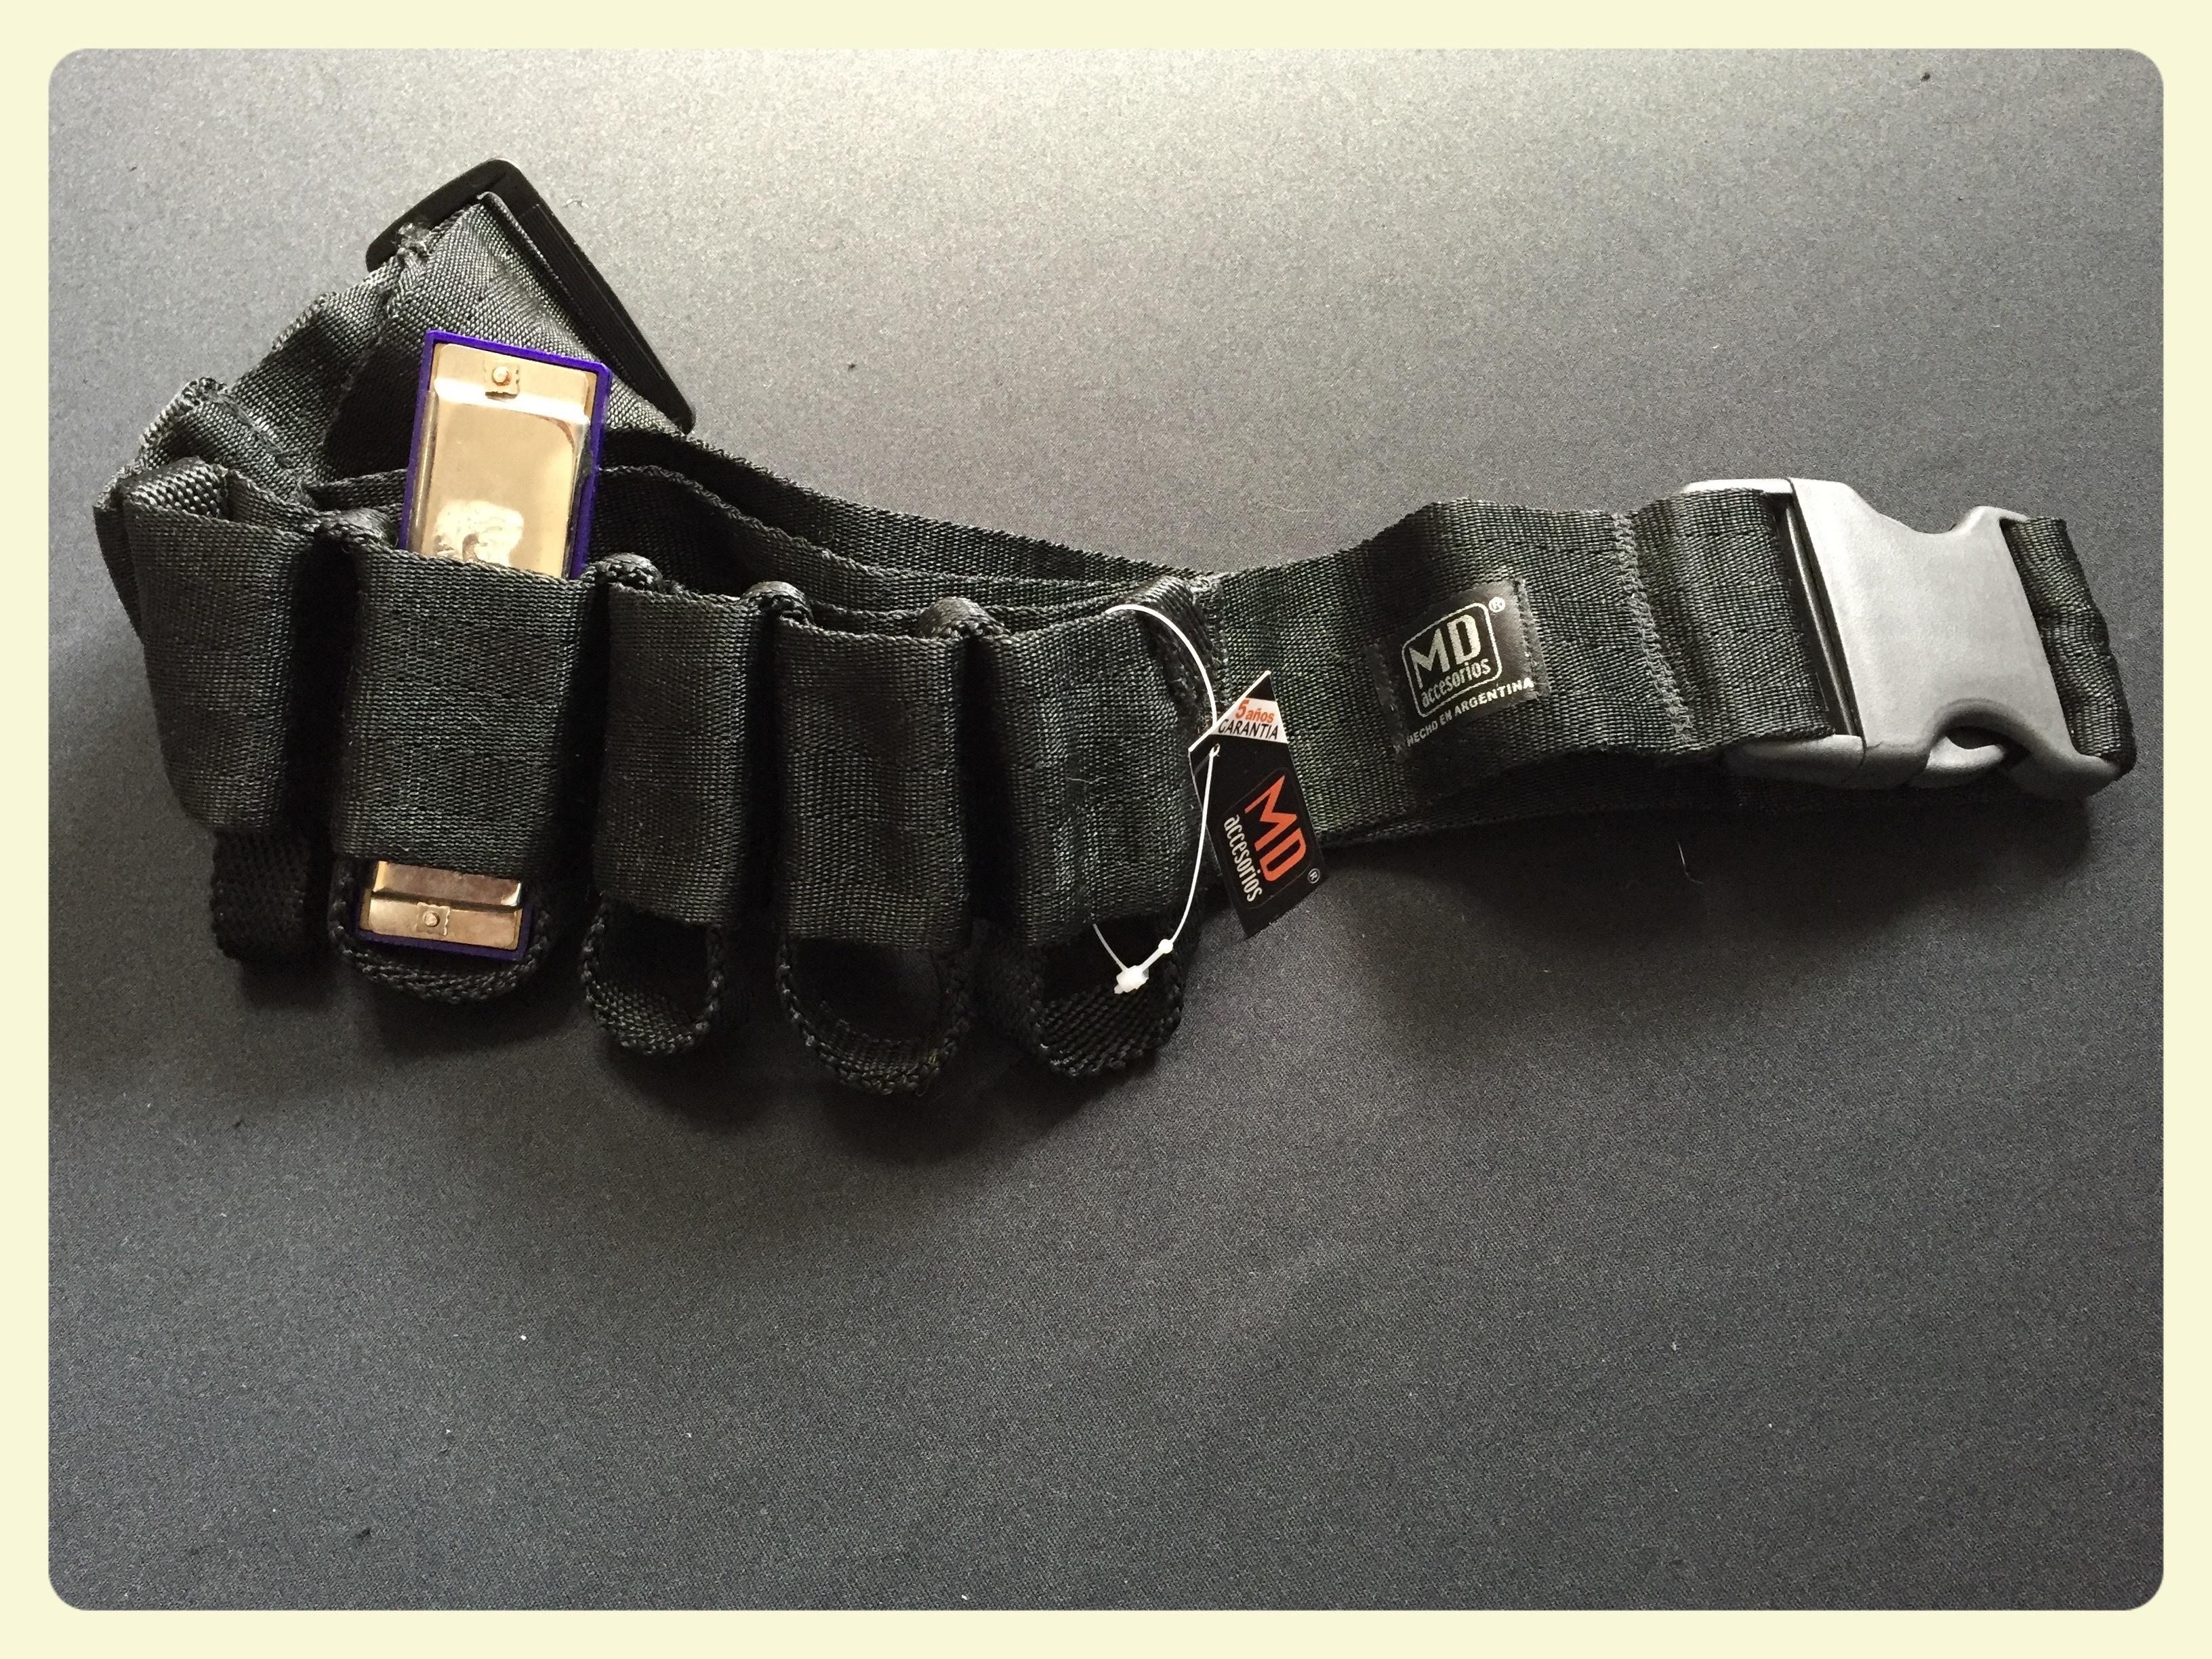 cinturón para armónicas